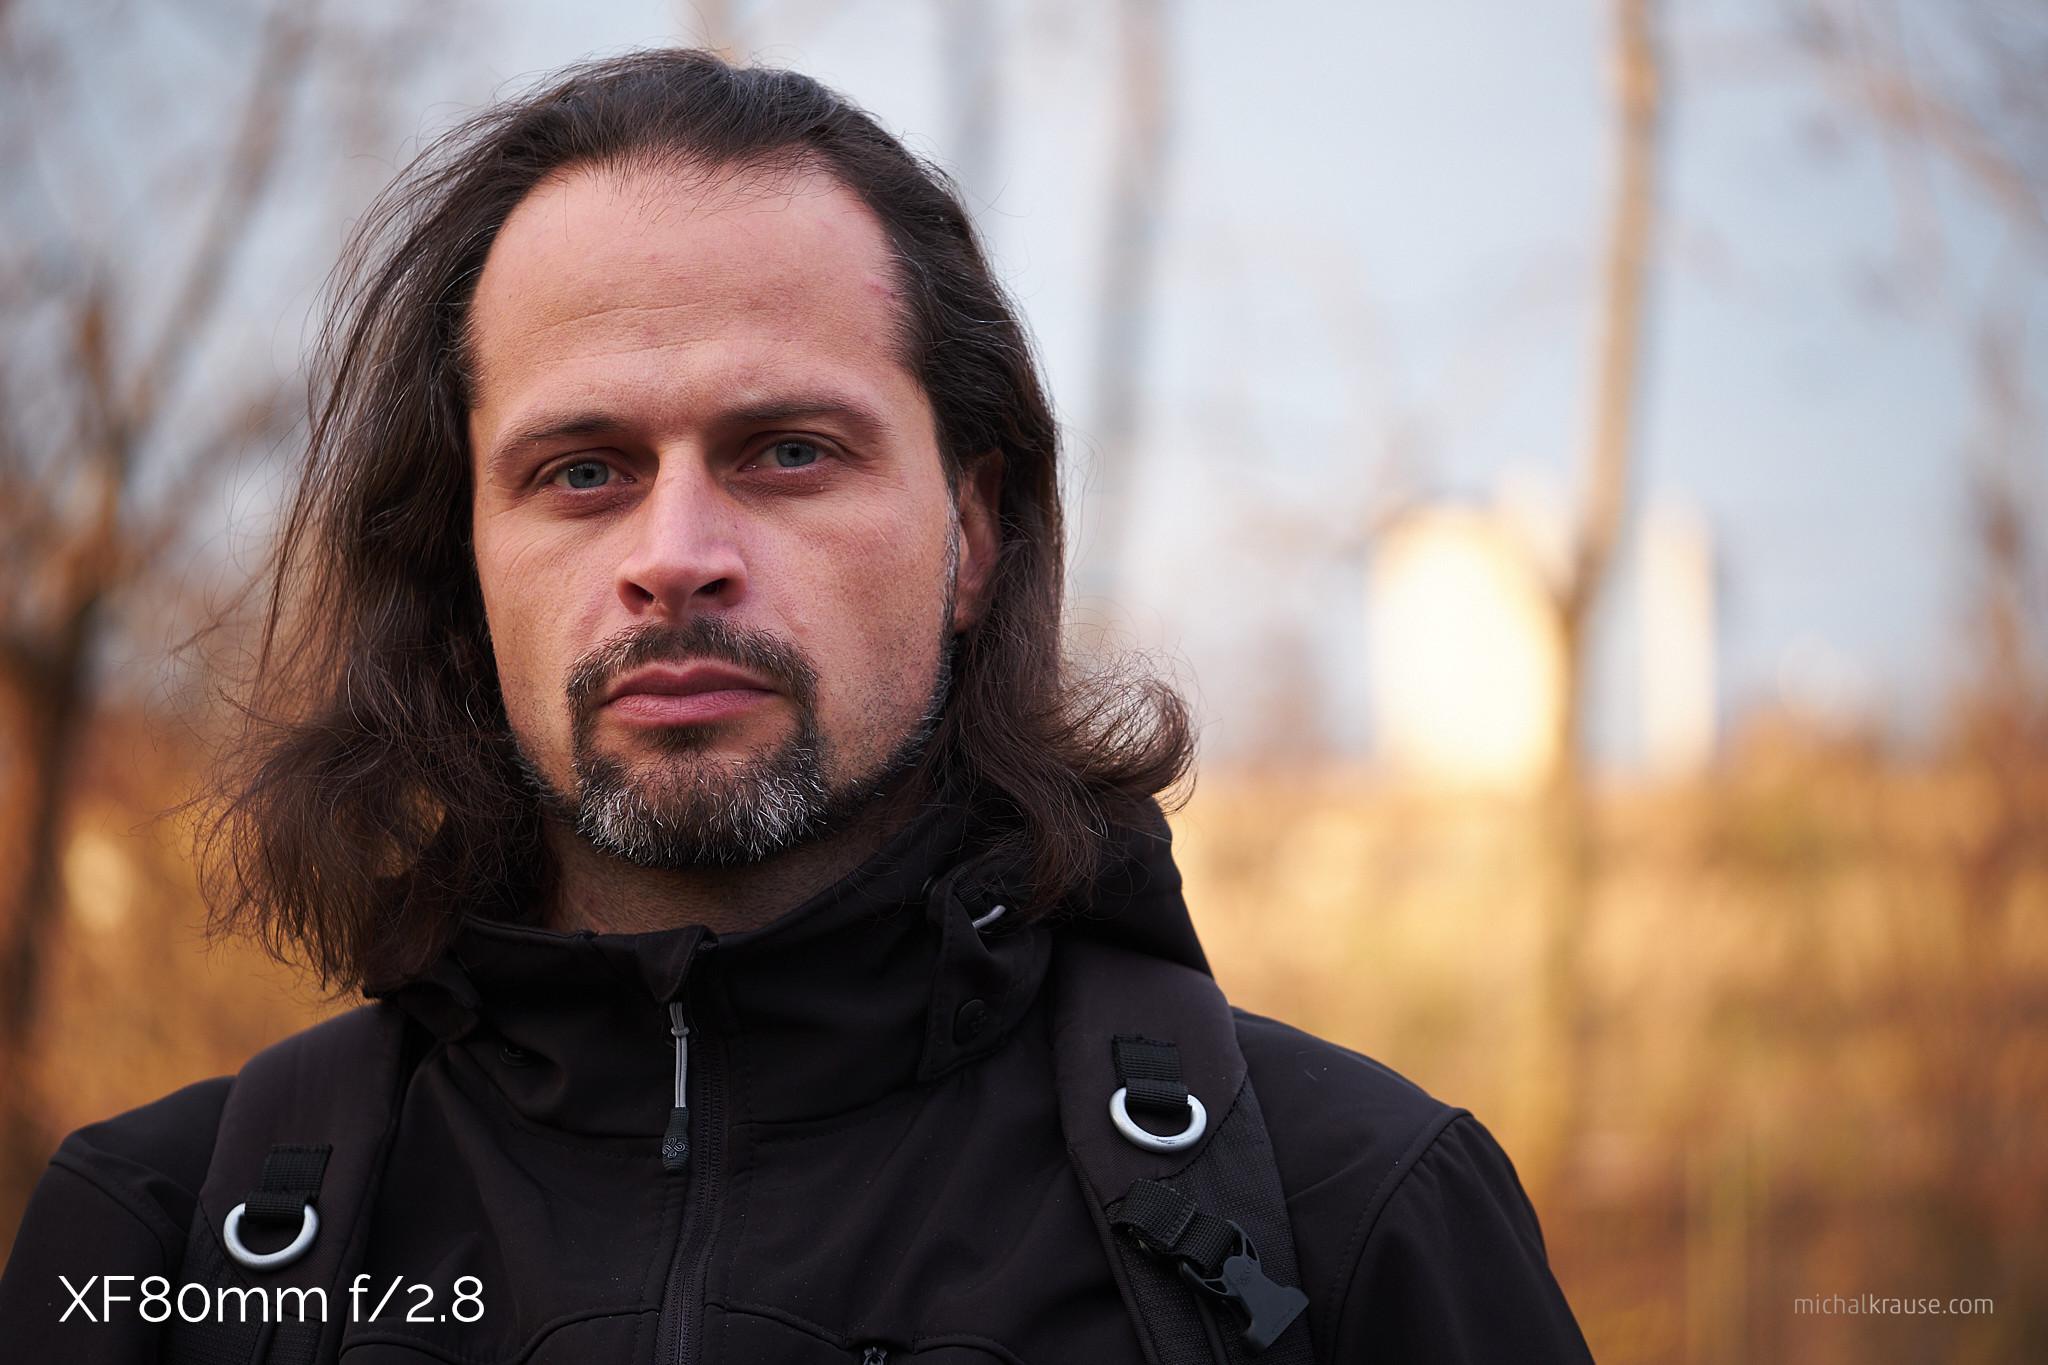 Portrait – XF80mmF2.8, f/2.8